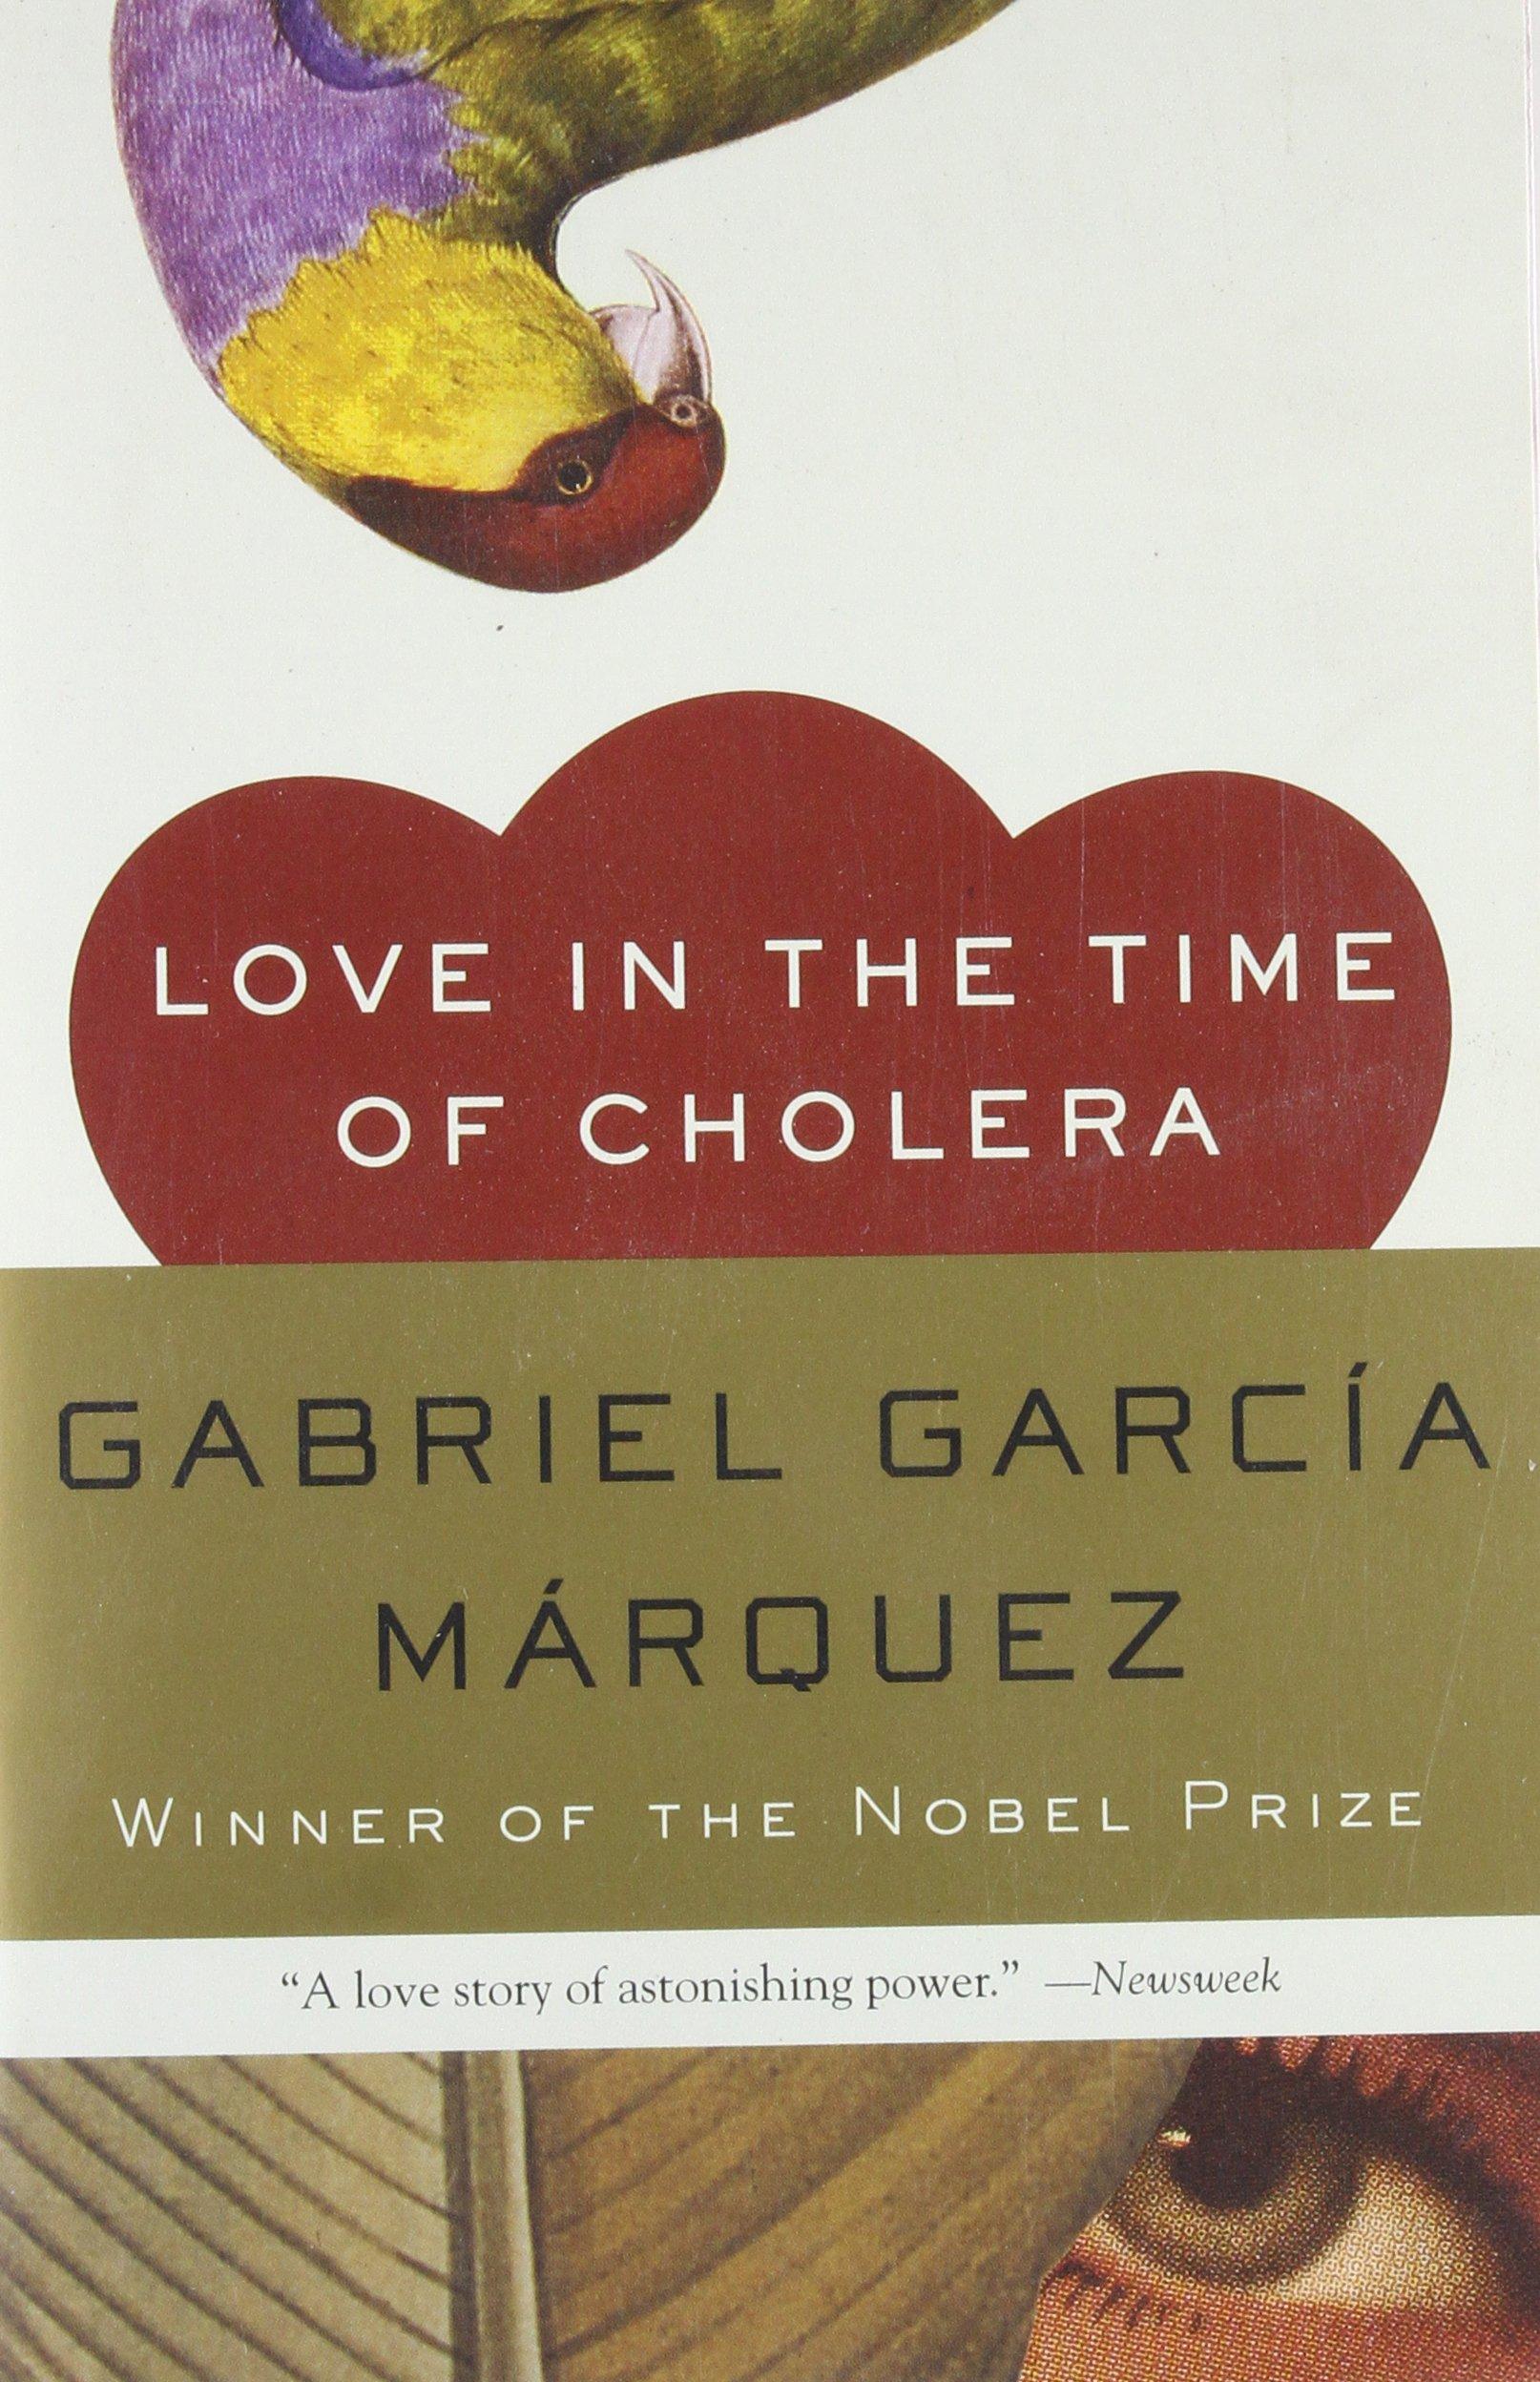 Amazon love in the time of cholera oprahs book club amazon love in the time of cholera oprahs book club 8601400332566 gabriel garcia marquez books fandeluxe Gallery